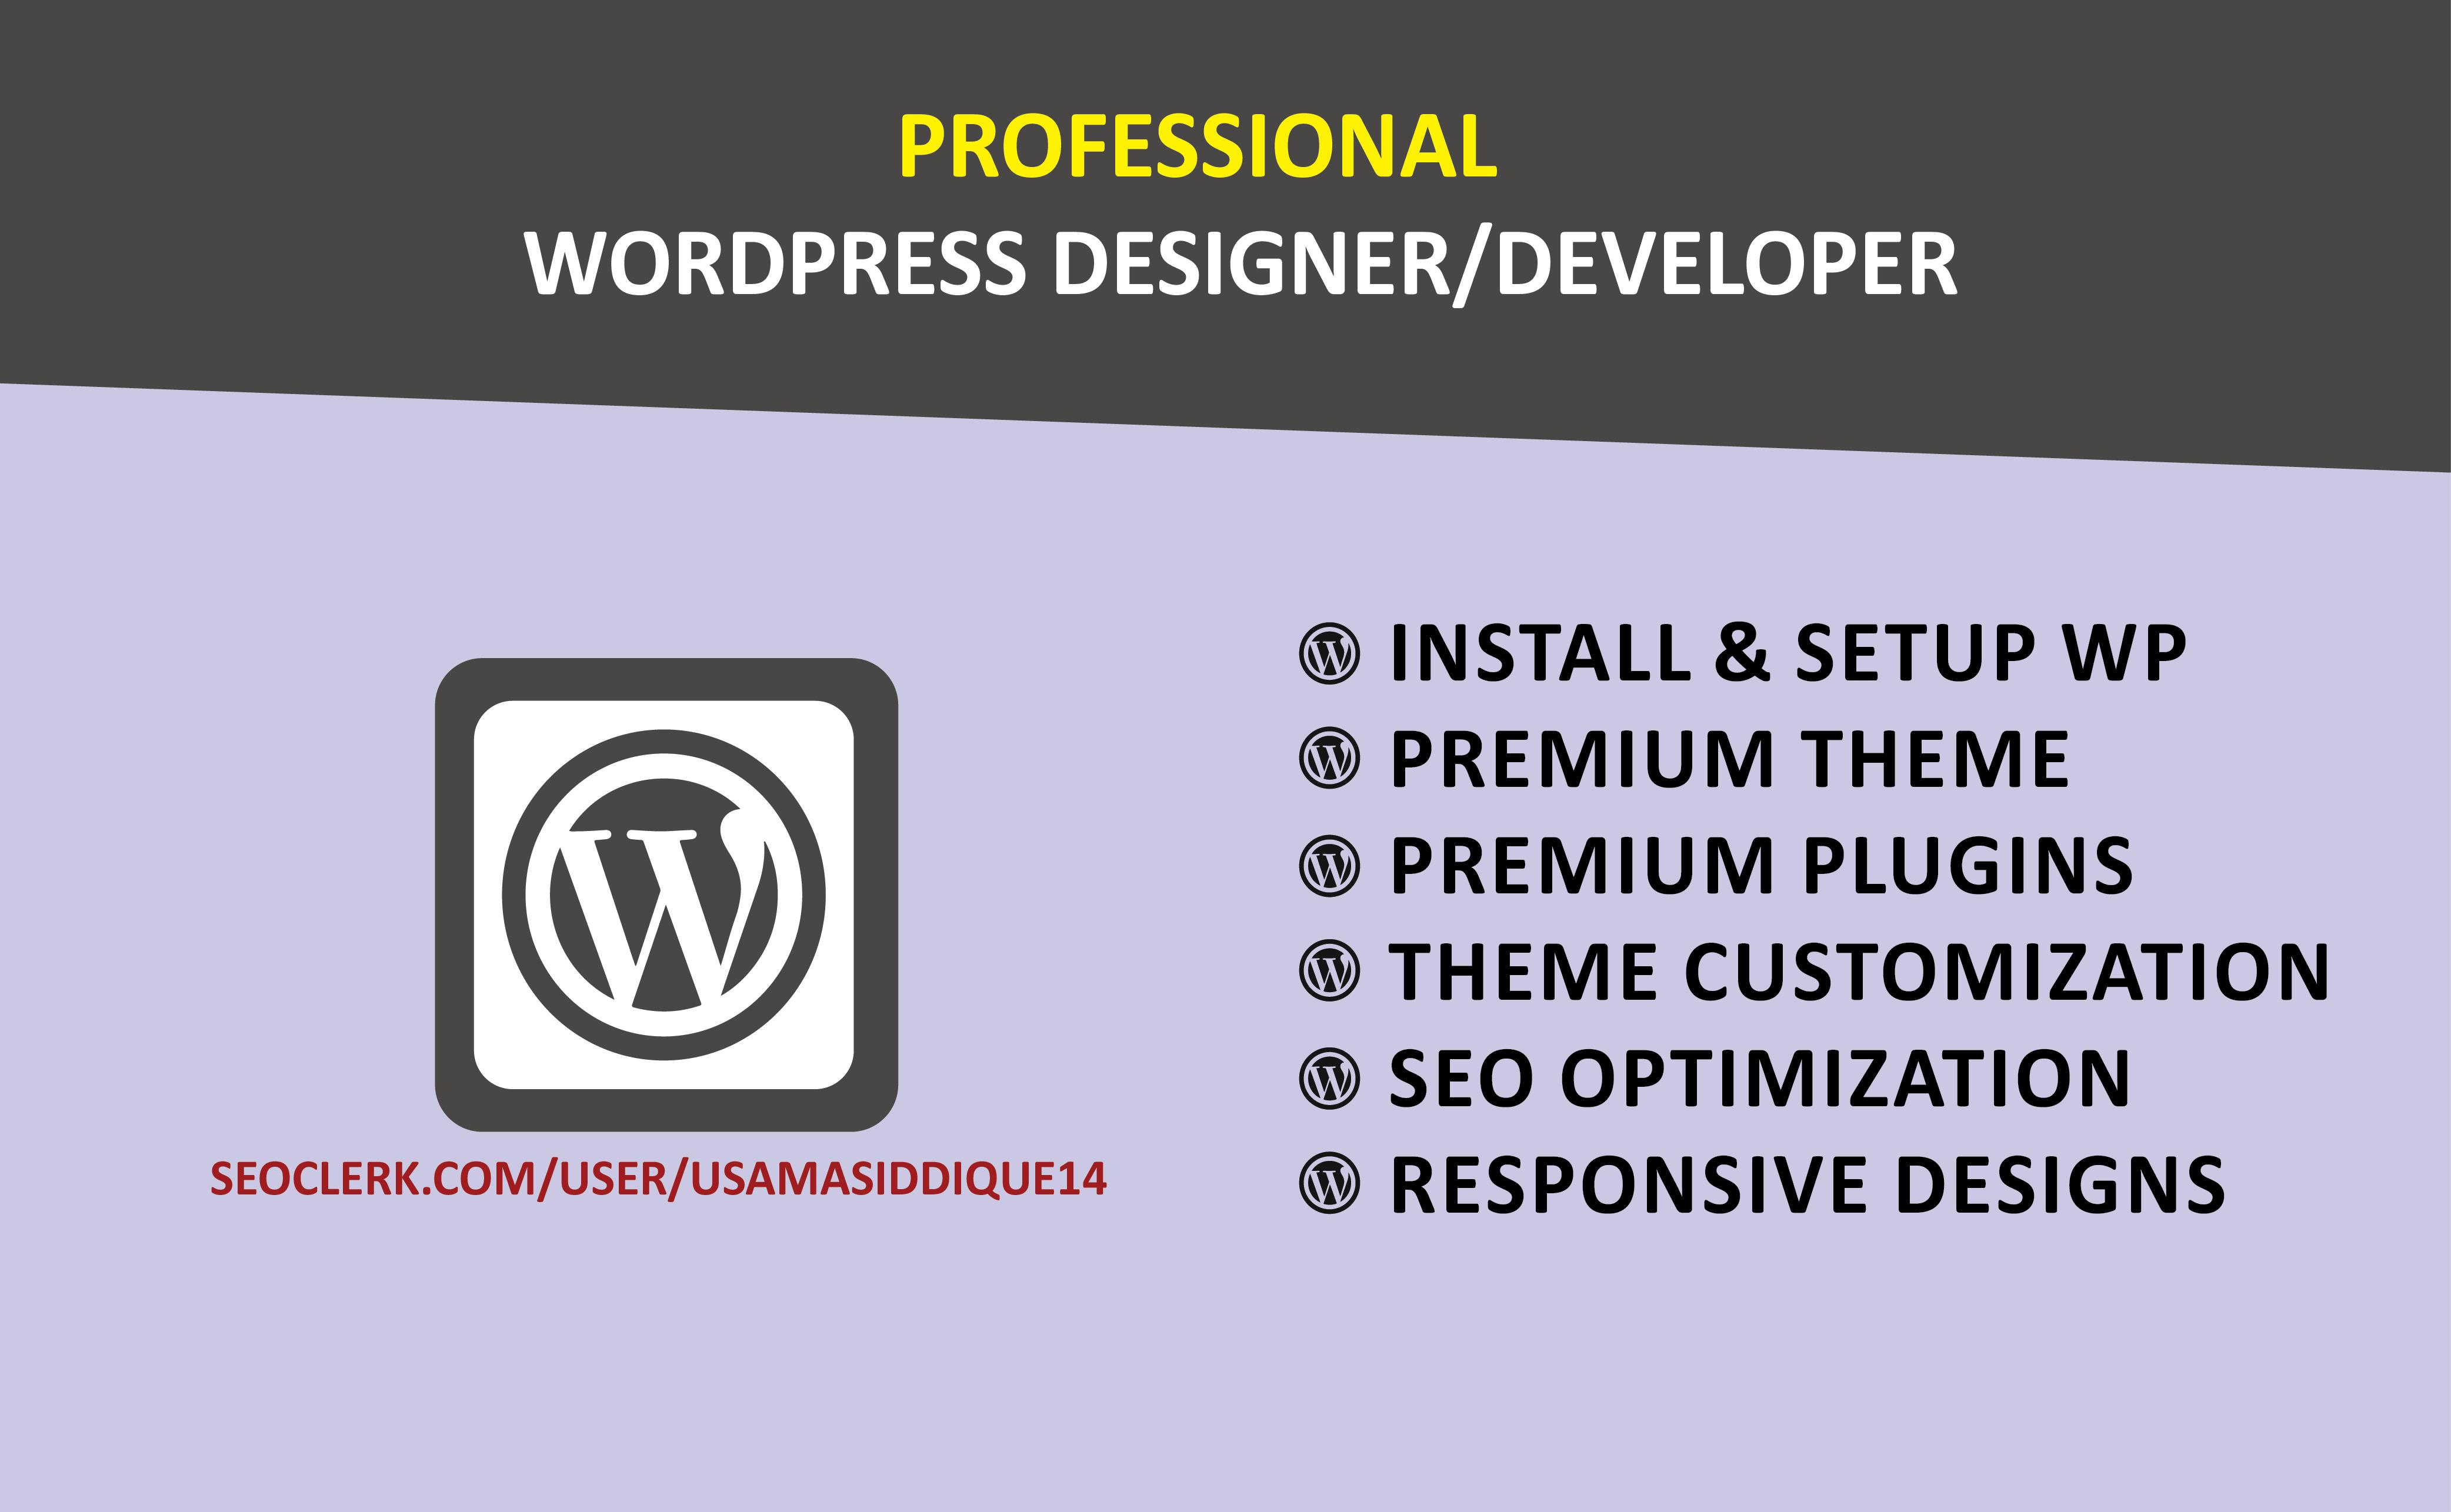 I will create professional responsive WordPress website